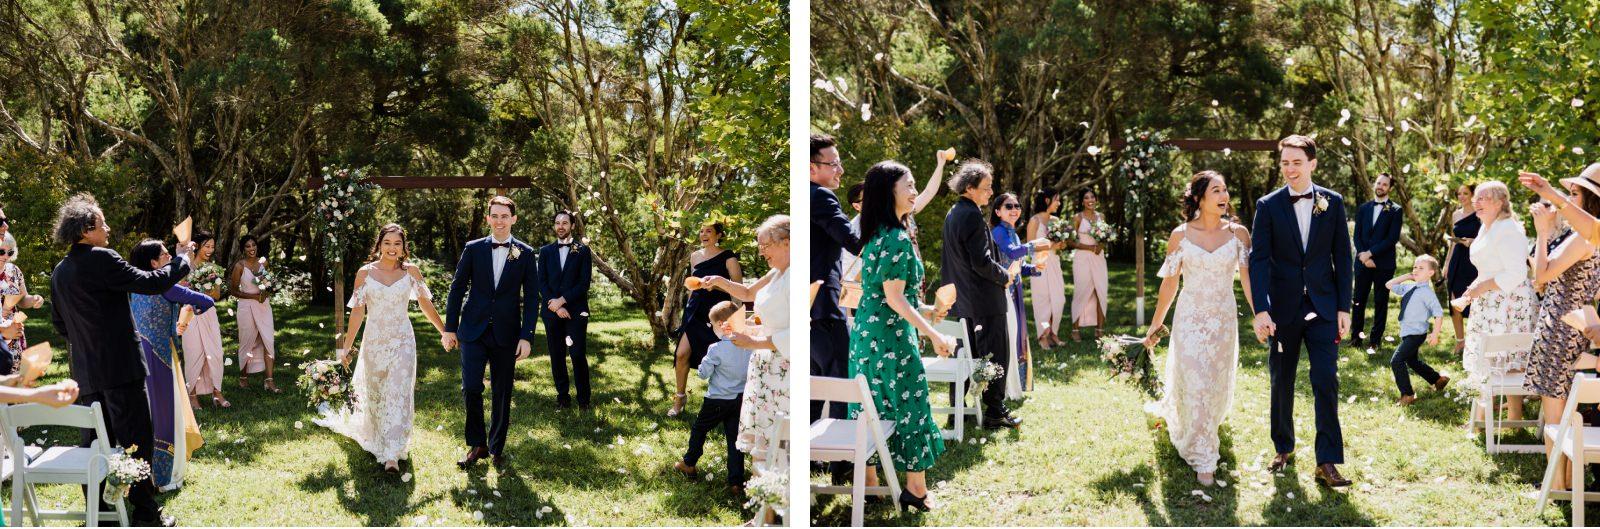 wollombi-wedding-photography-hunter-valley-wedding-photographers-42